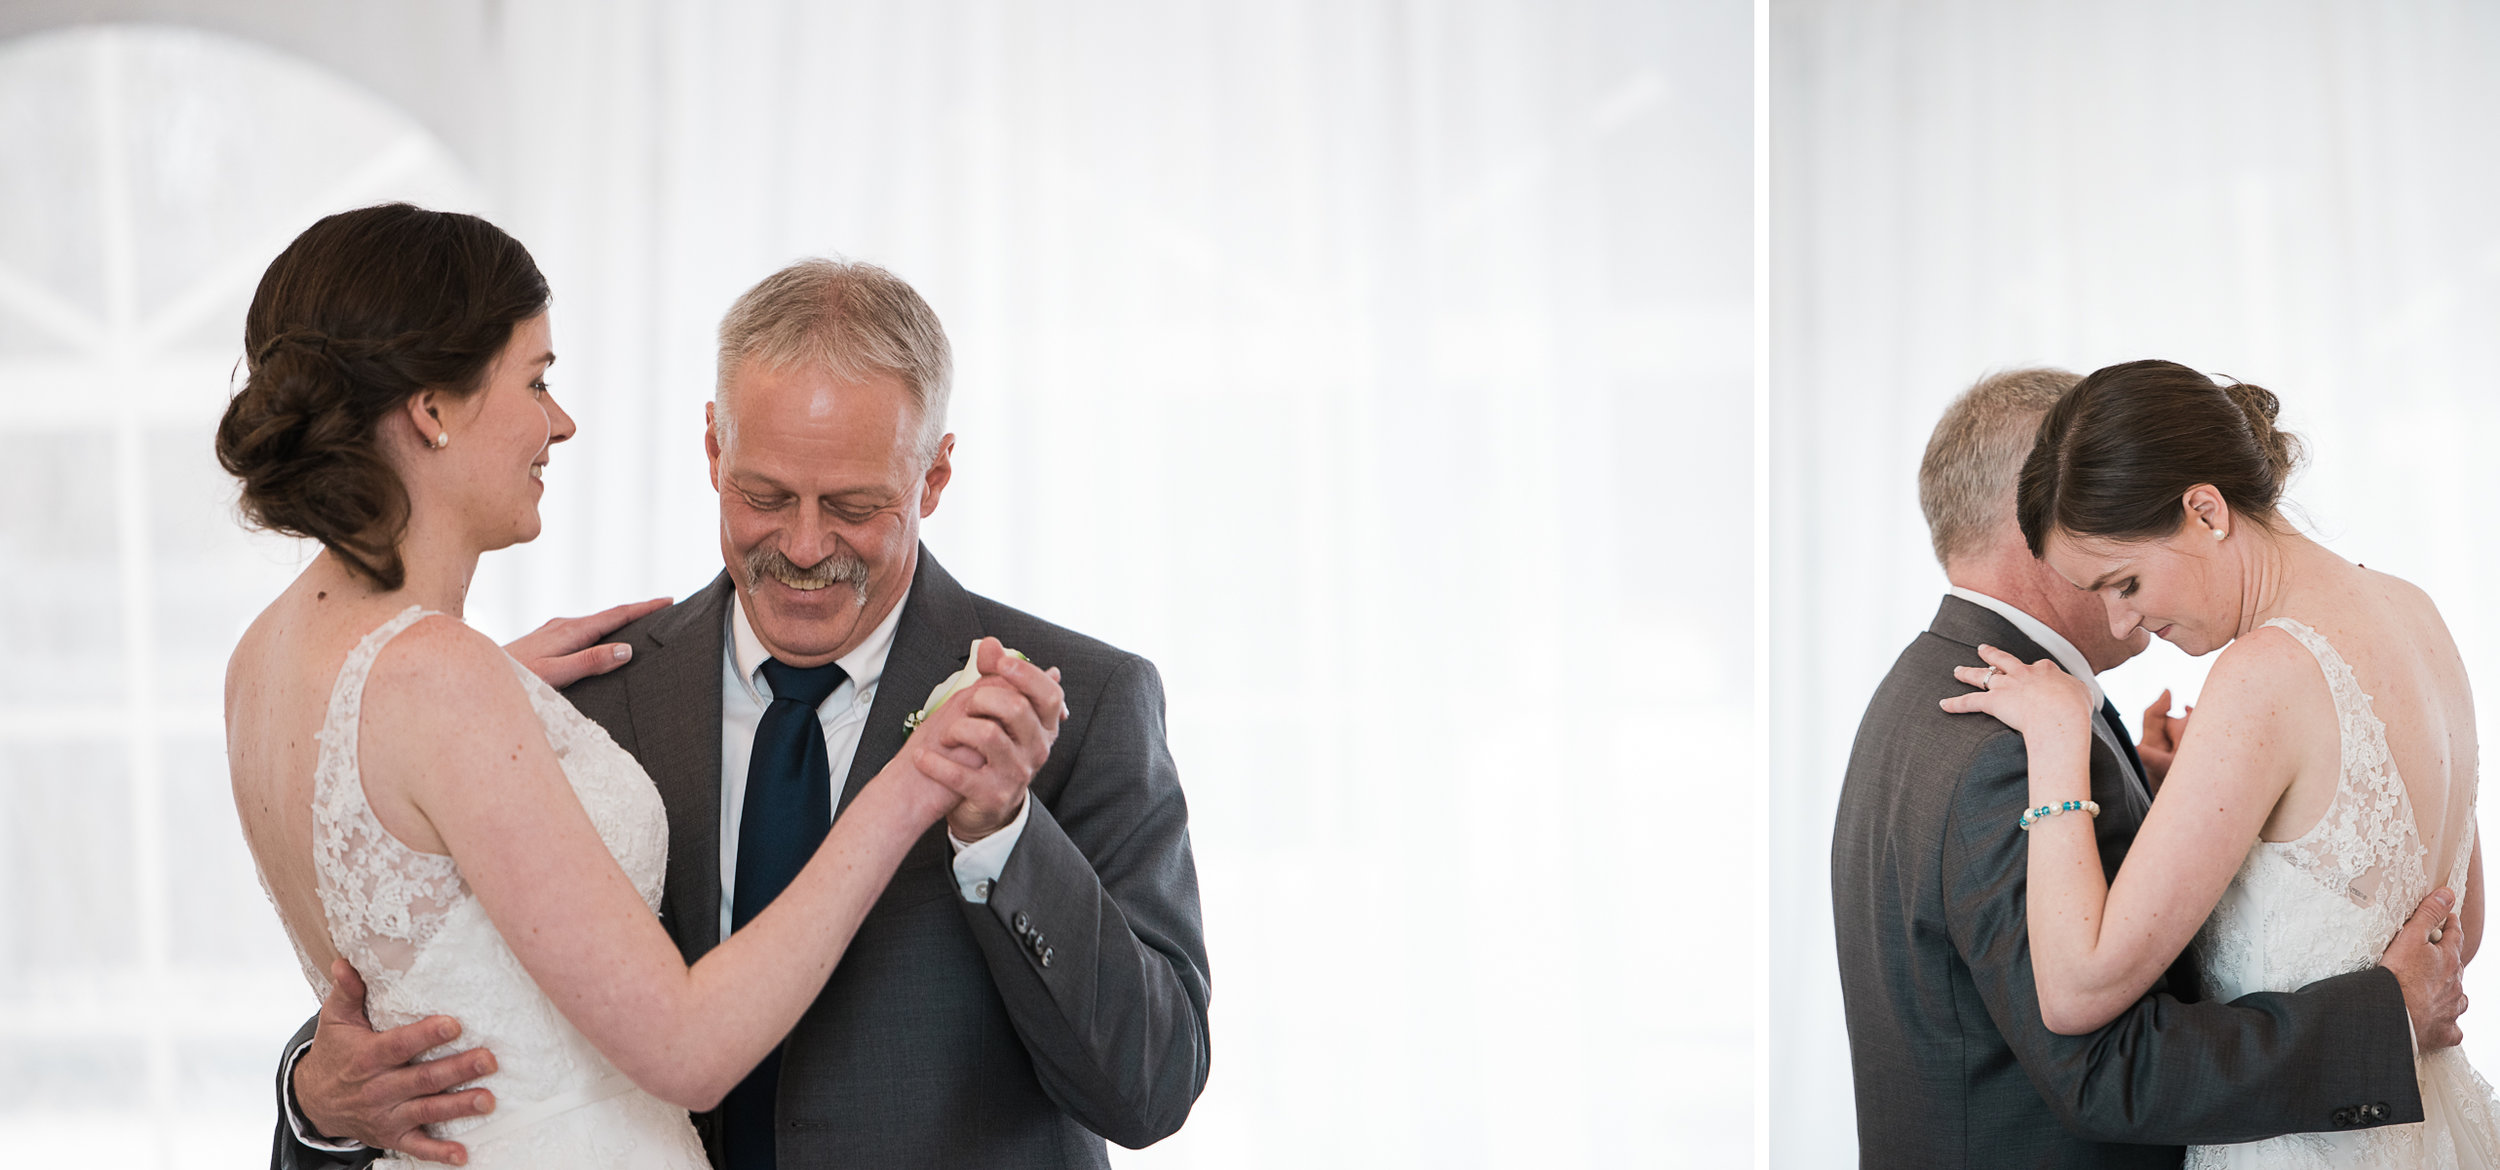 father daughter dance rust manor wedding mariah fisher.jpg